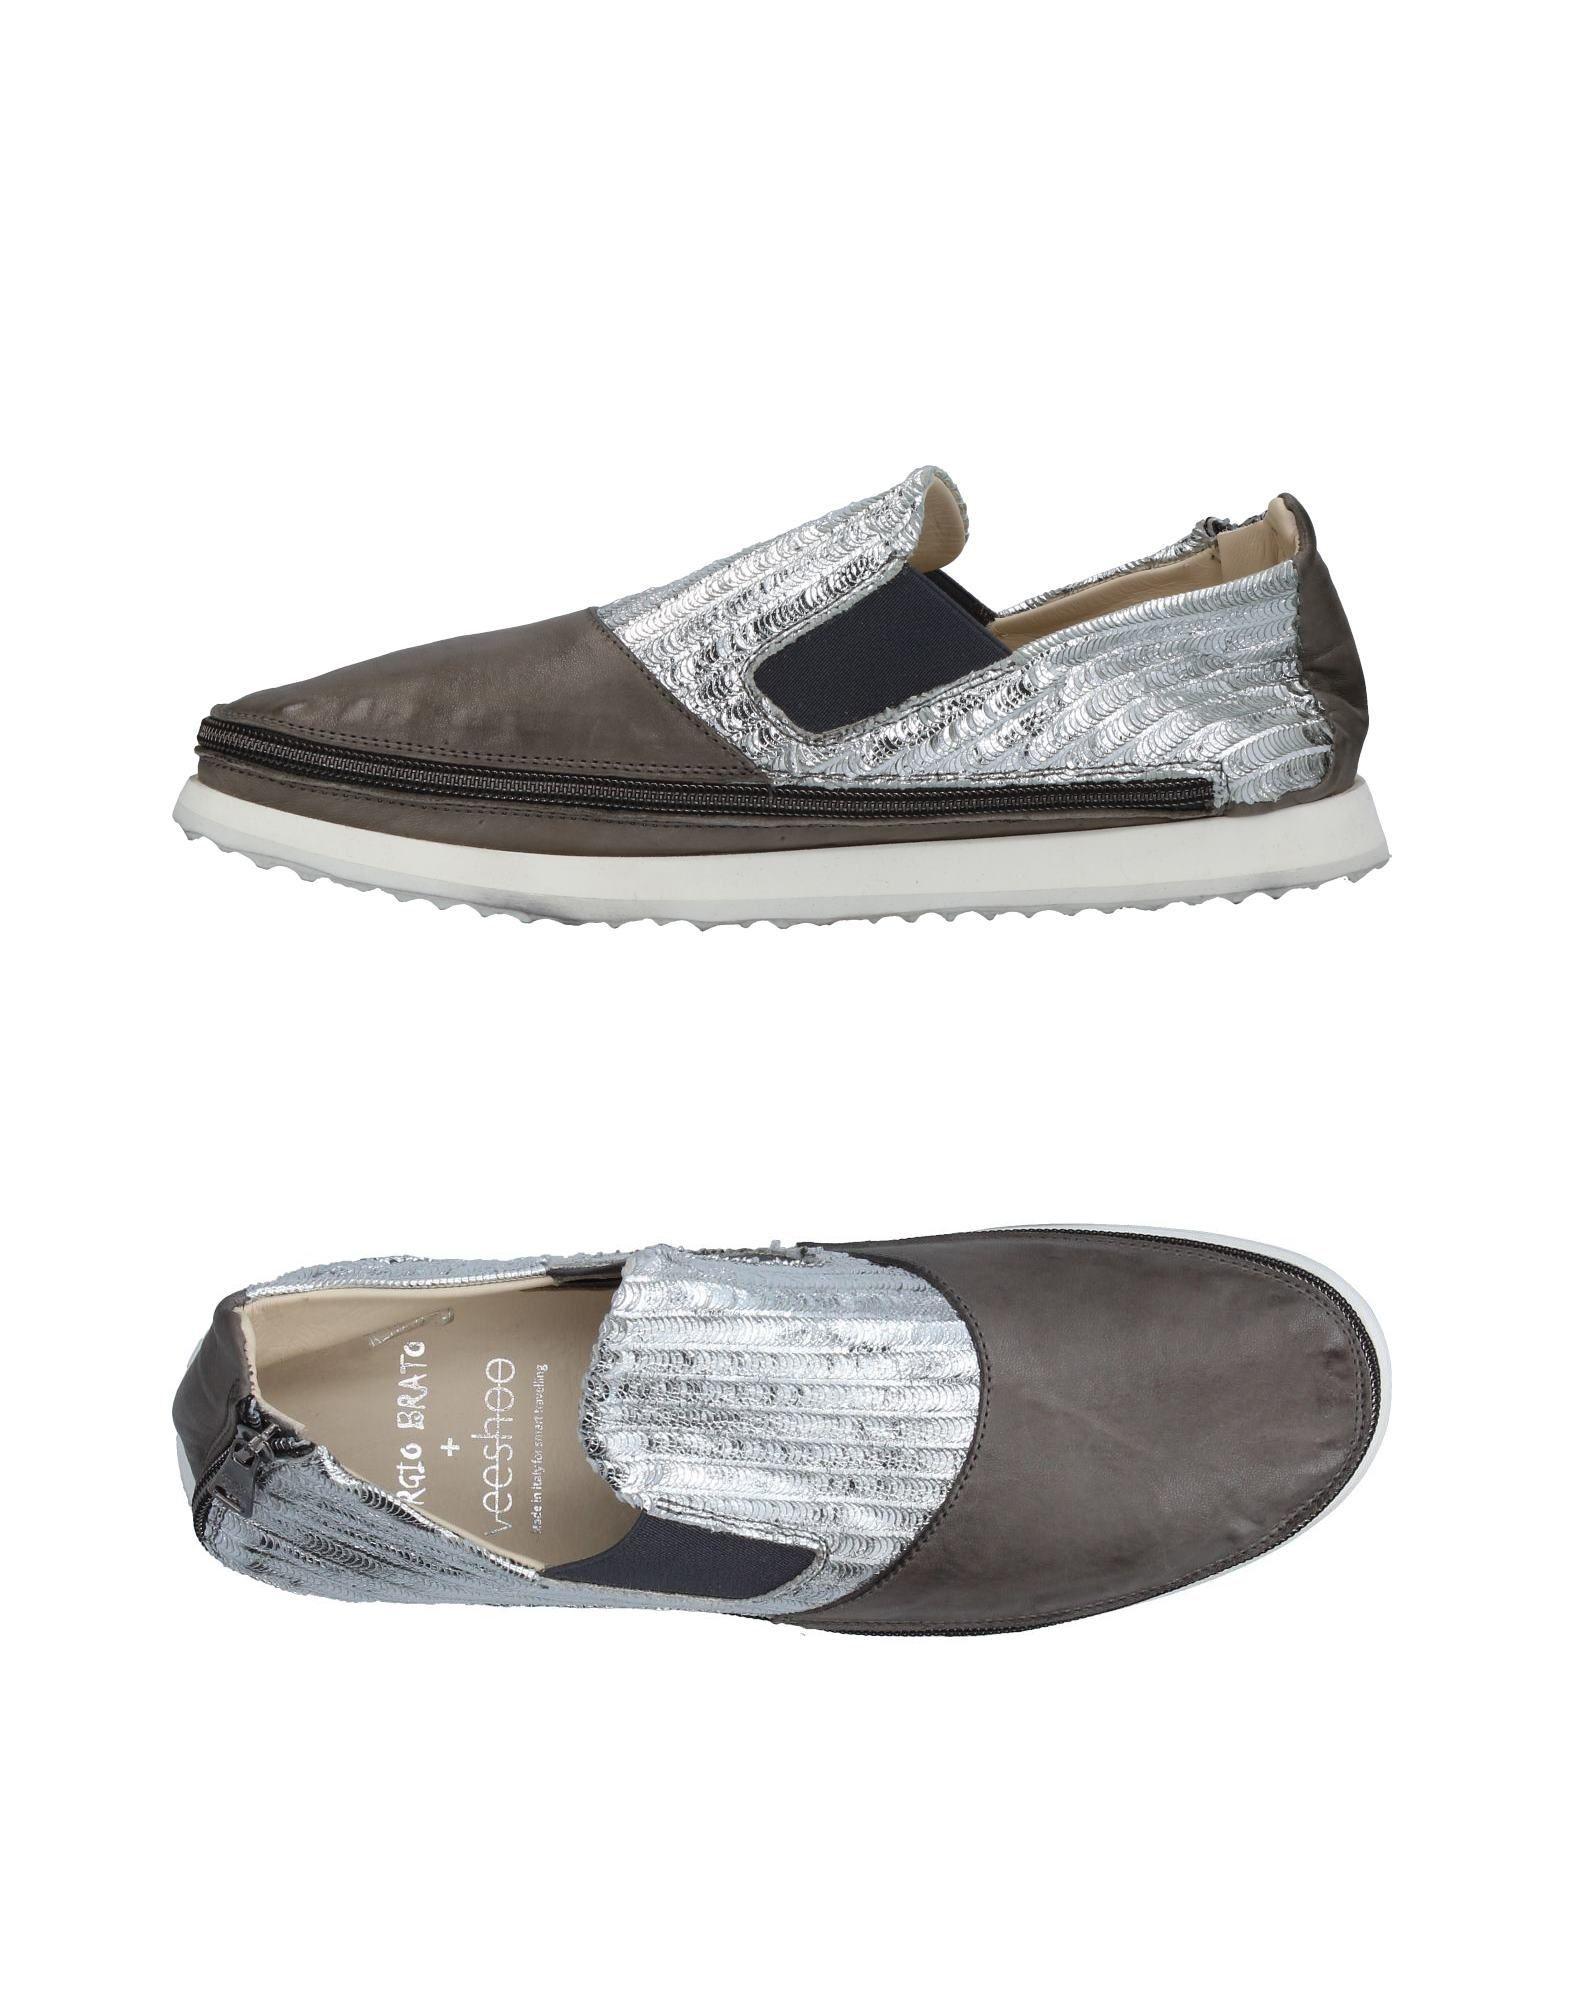 Sneakers Giorgio Brato + Veeshoo Homme - Sneakers Giorgio Brato + Veeshoo  Gris Meilleur modèle de vente